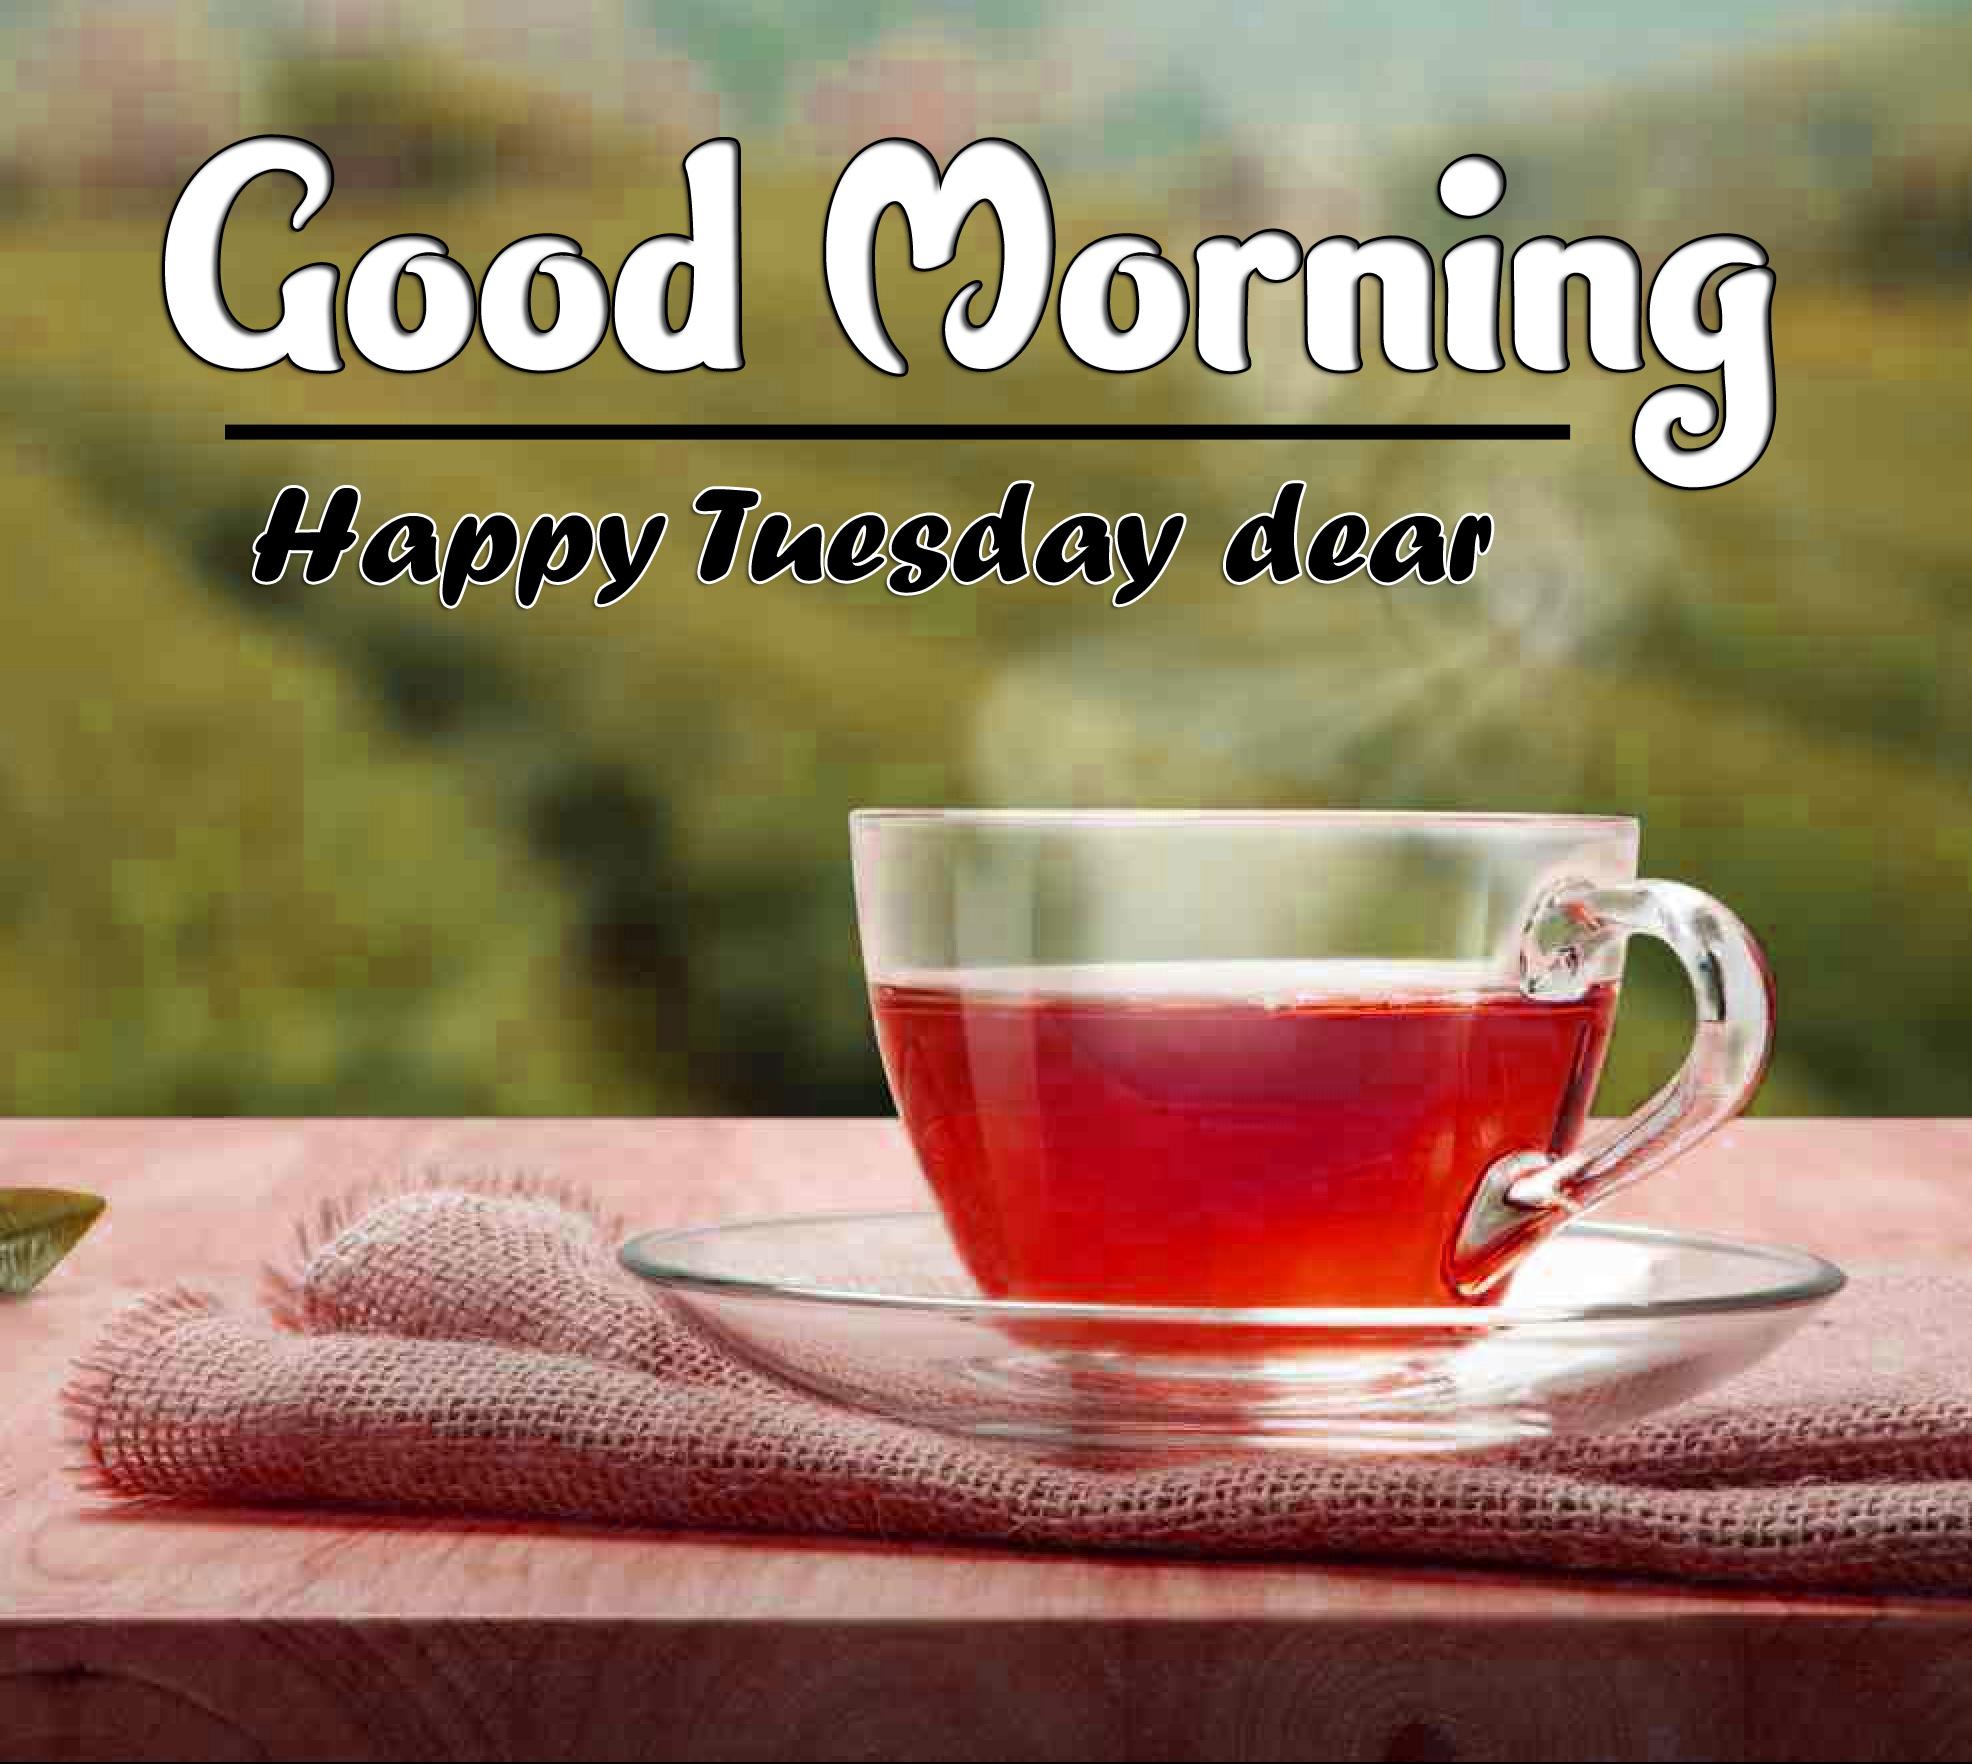 Tuesday Good Morning Pics Free